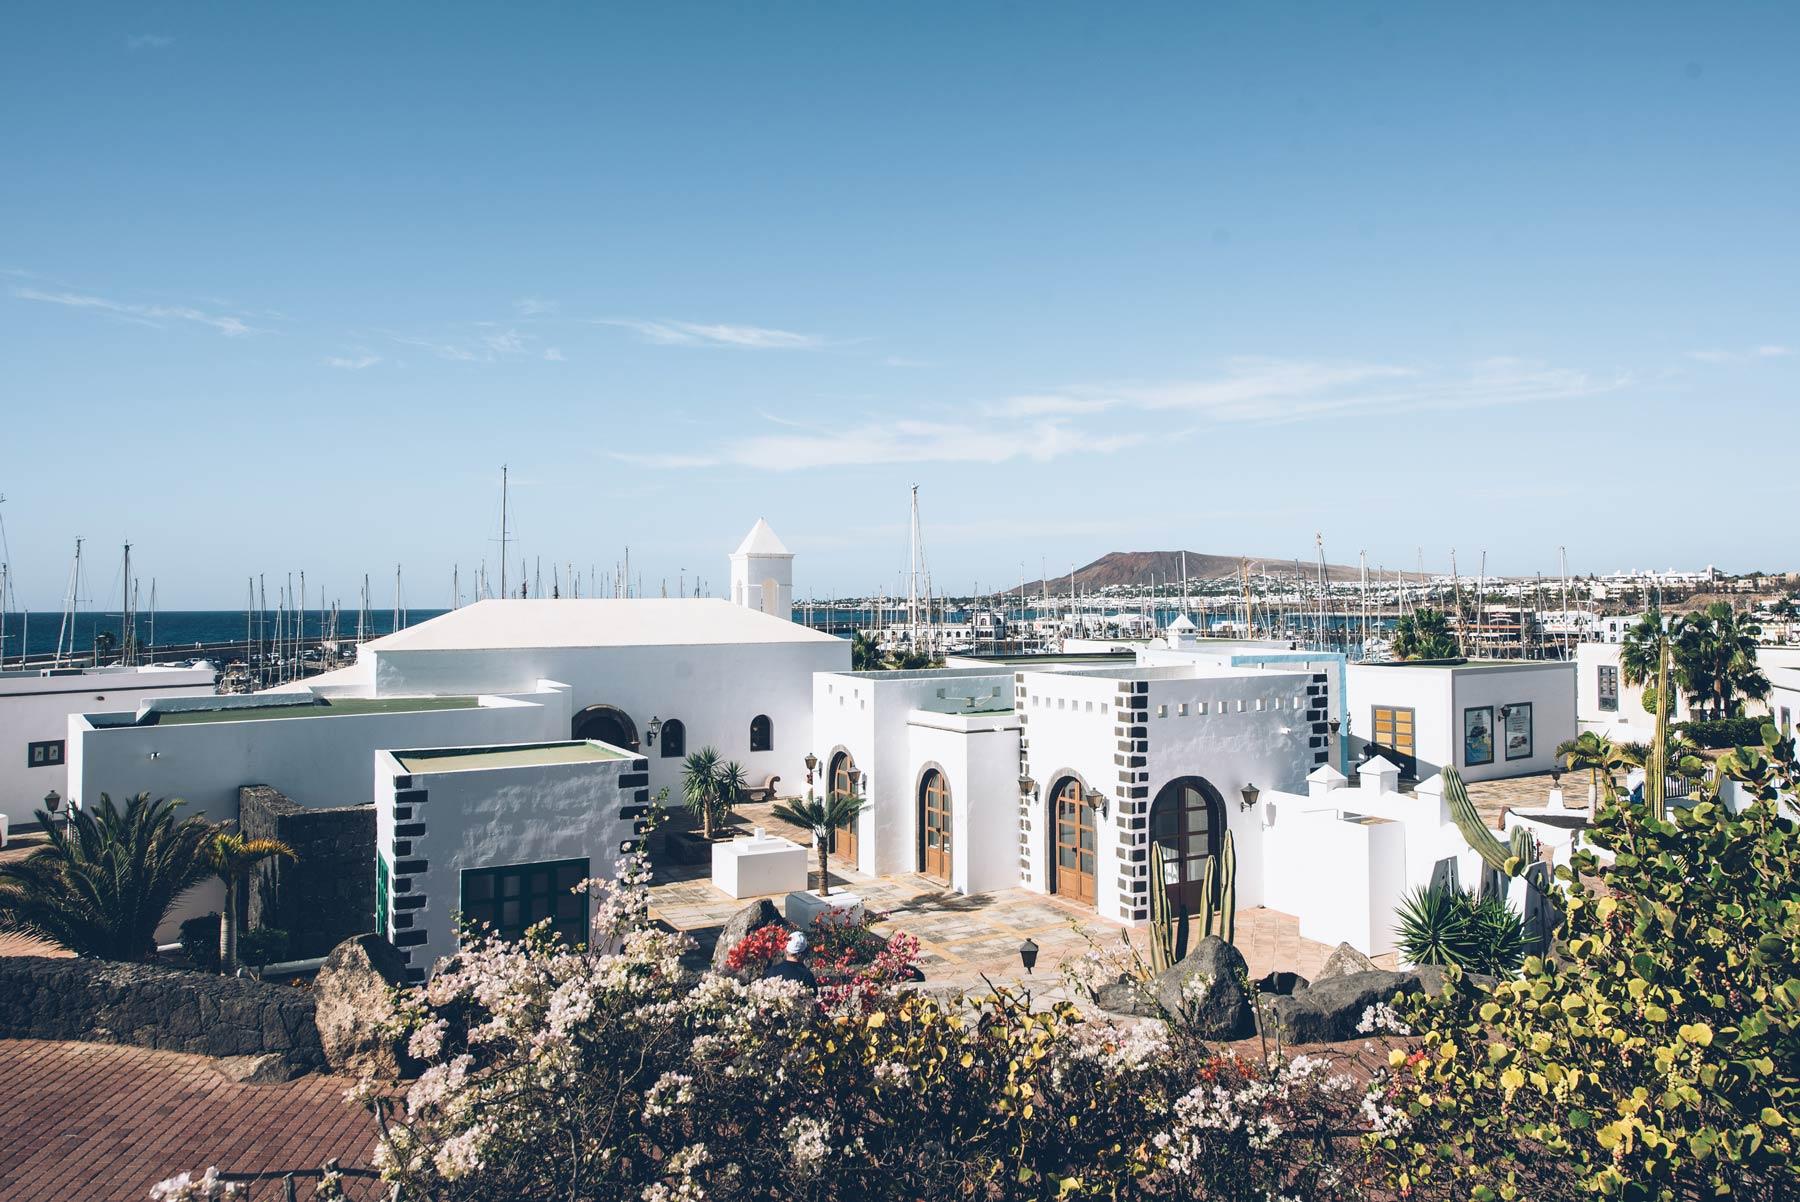 06-Playa-Blanca-Lanzarote.jpg